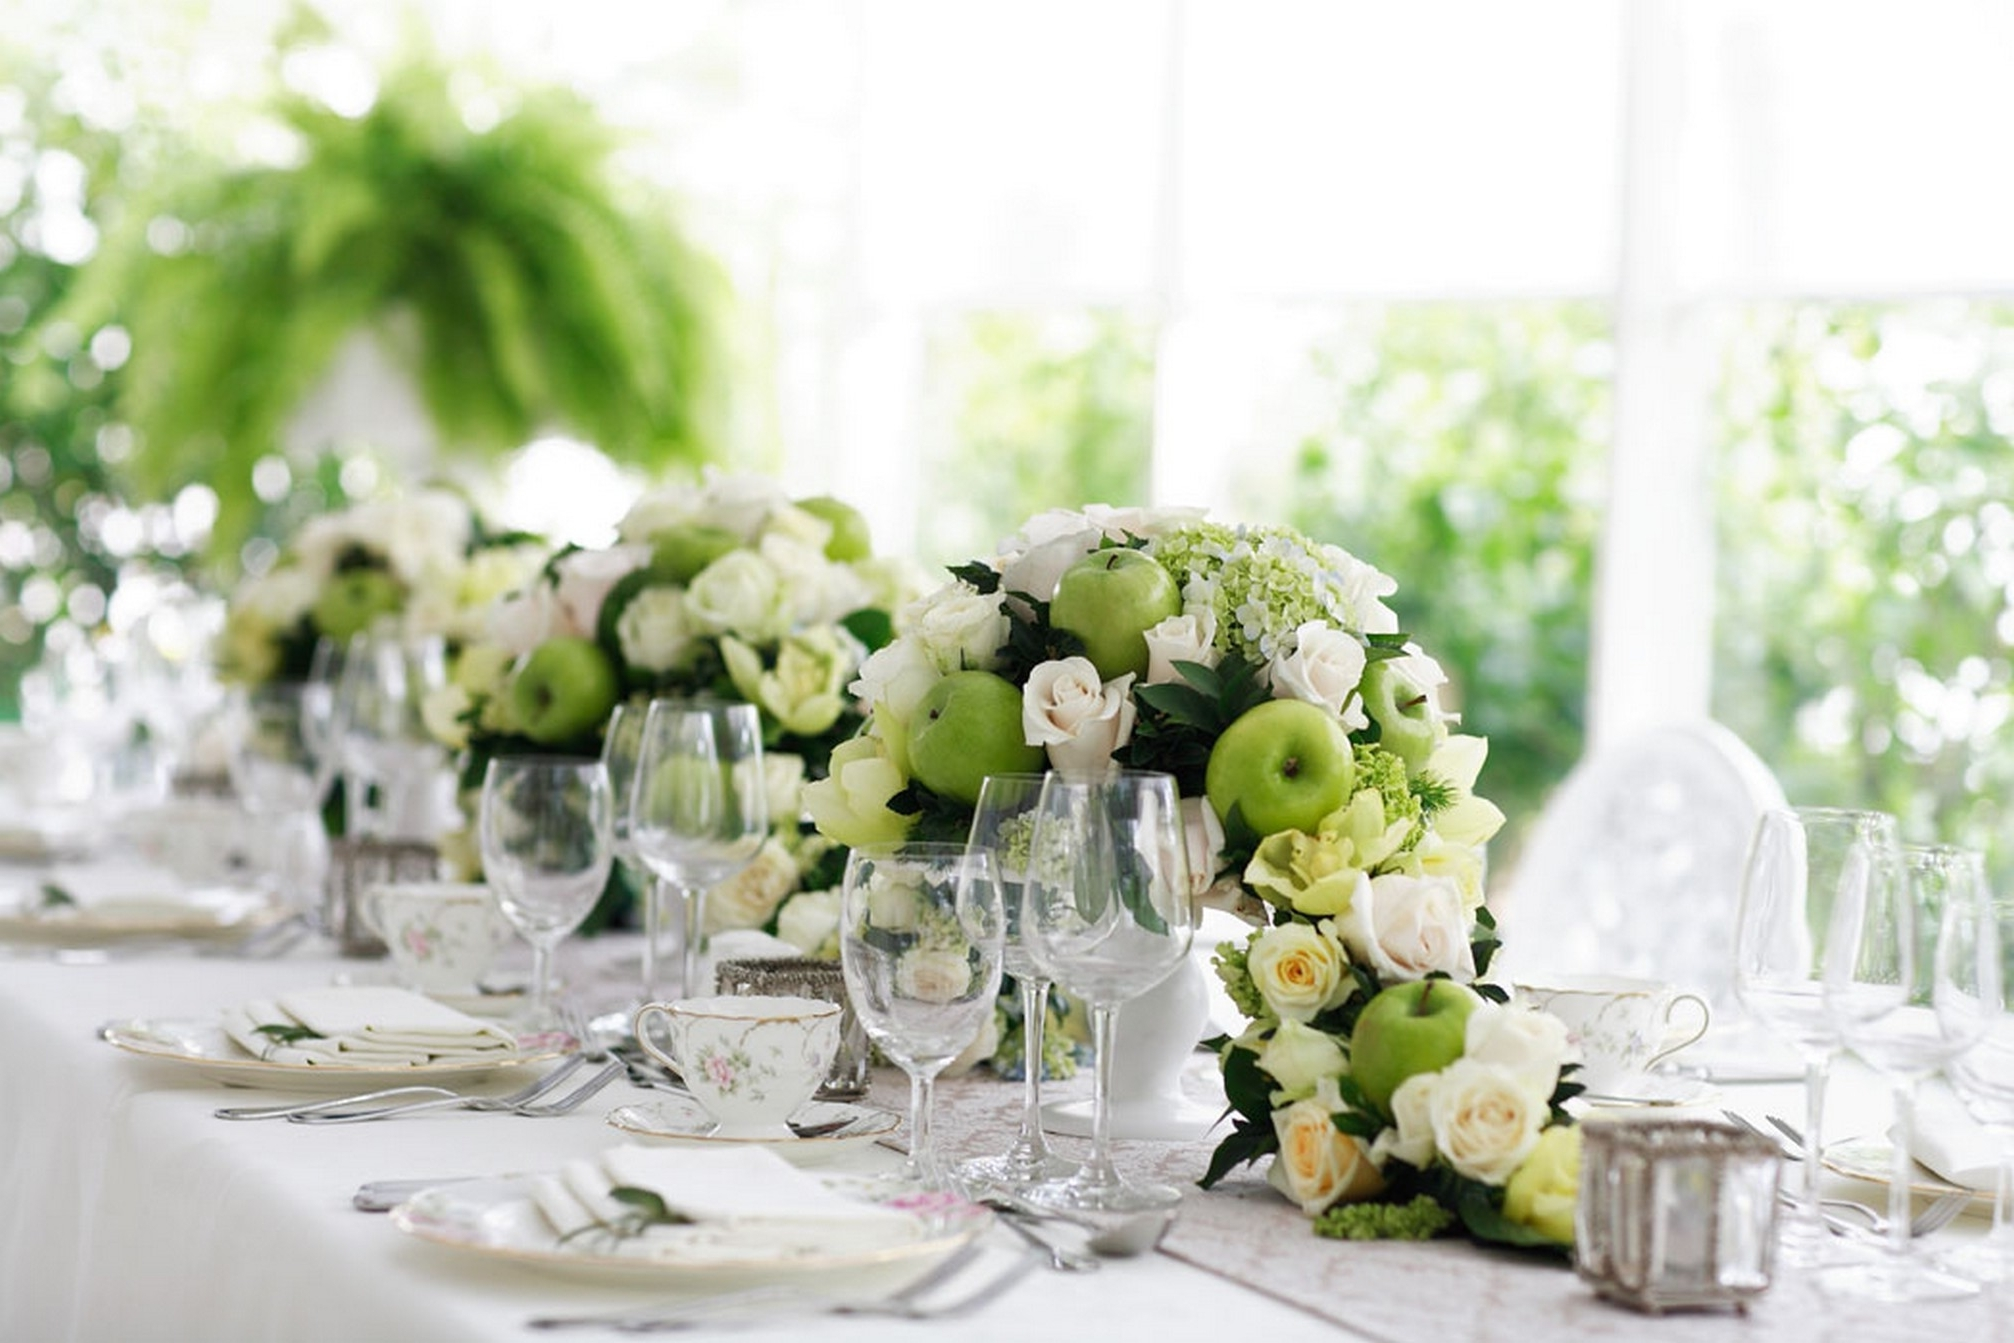 Wedding Table Flower Arrangements Ideas – Auroravine For 2017 Artificial Floral Arrangements For Dining Tables (View 19 of 25)